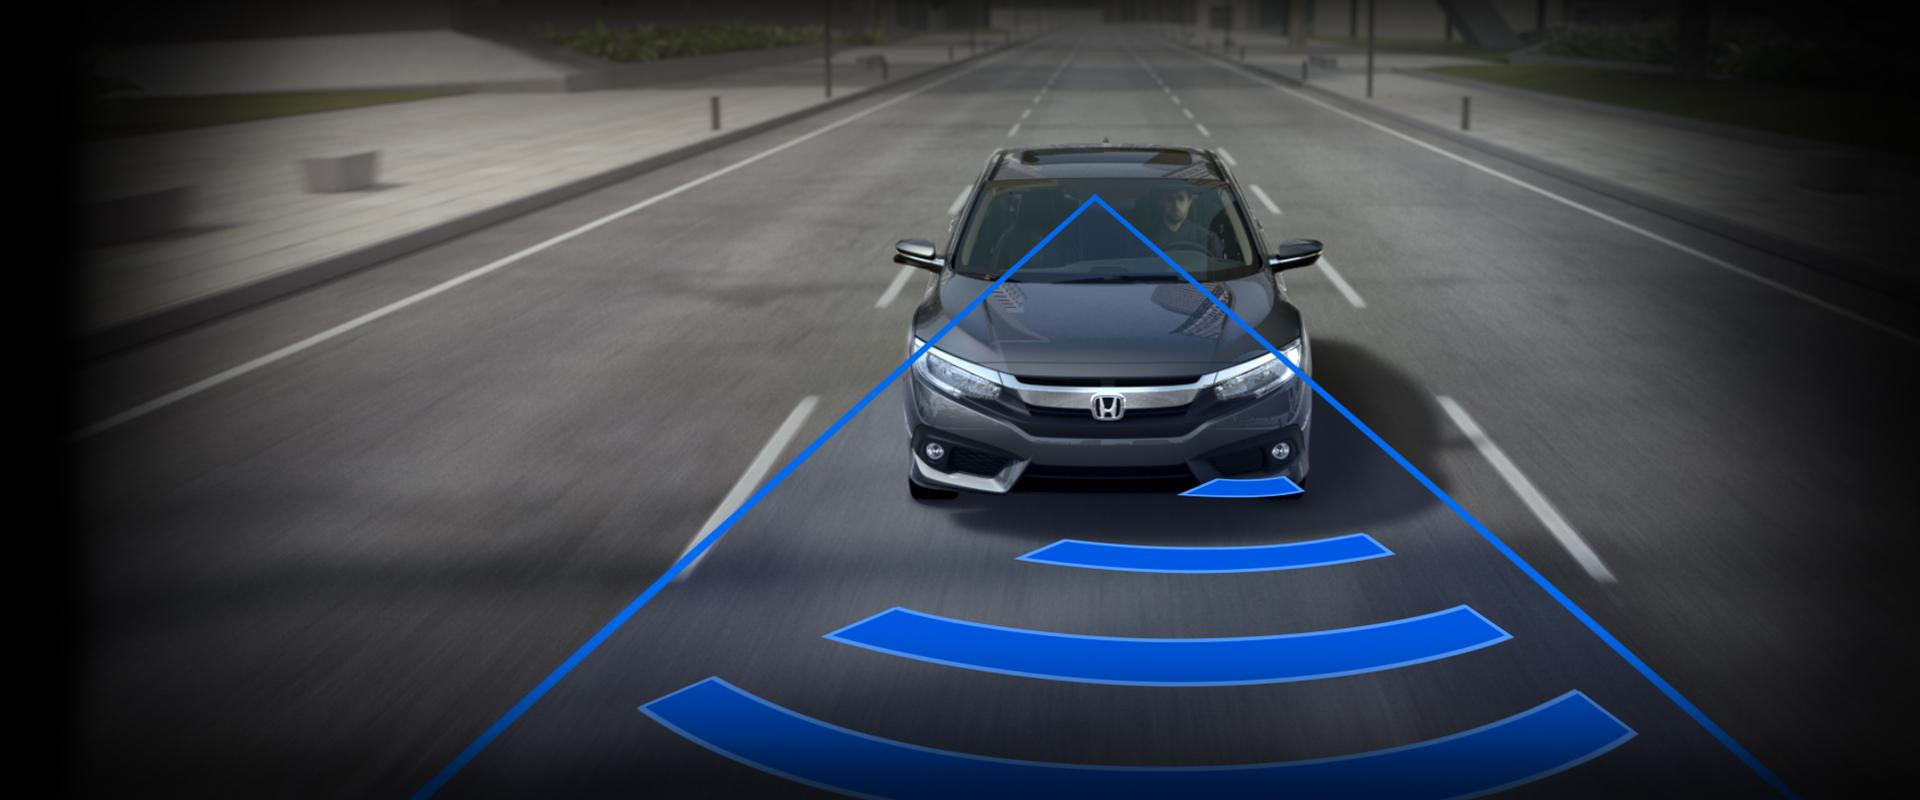 Honda Civic Collision Mitigation Braking System